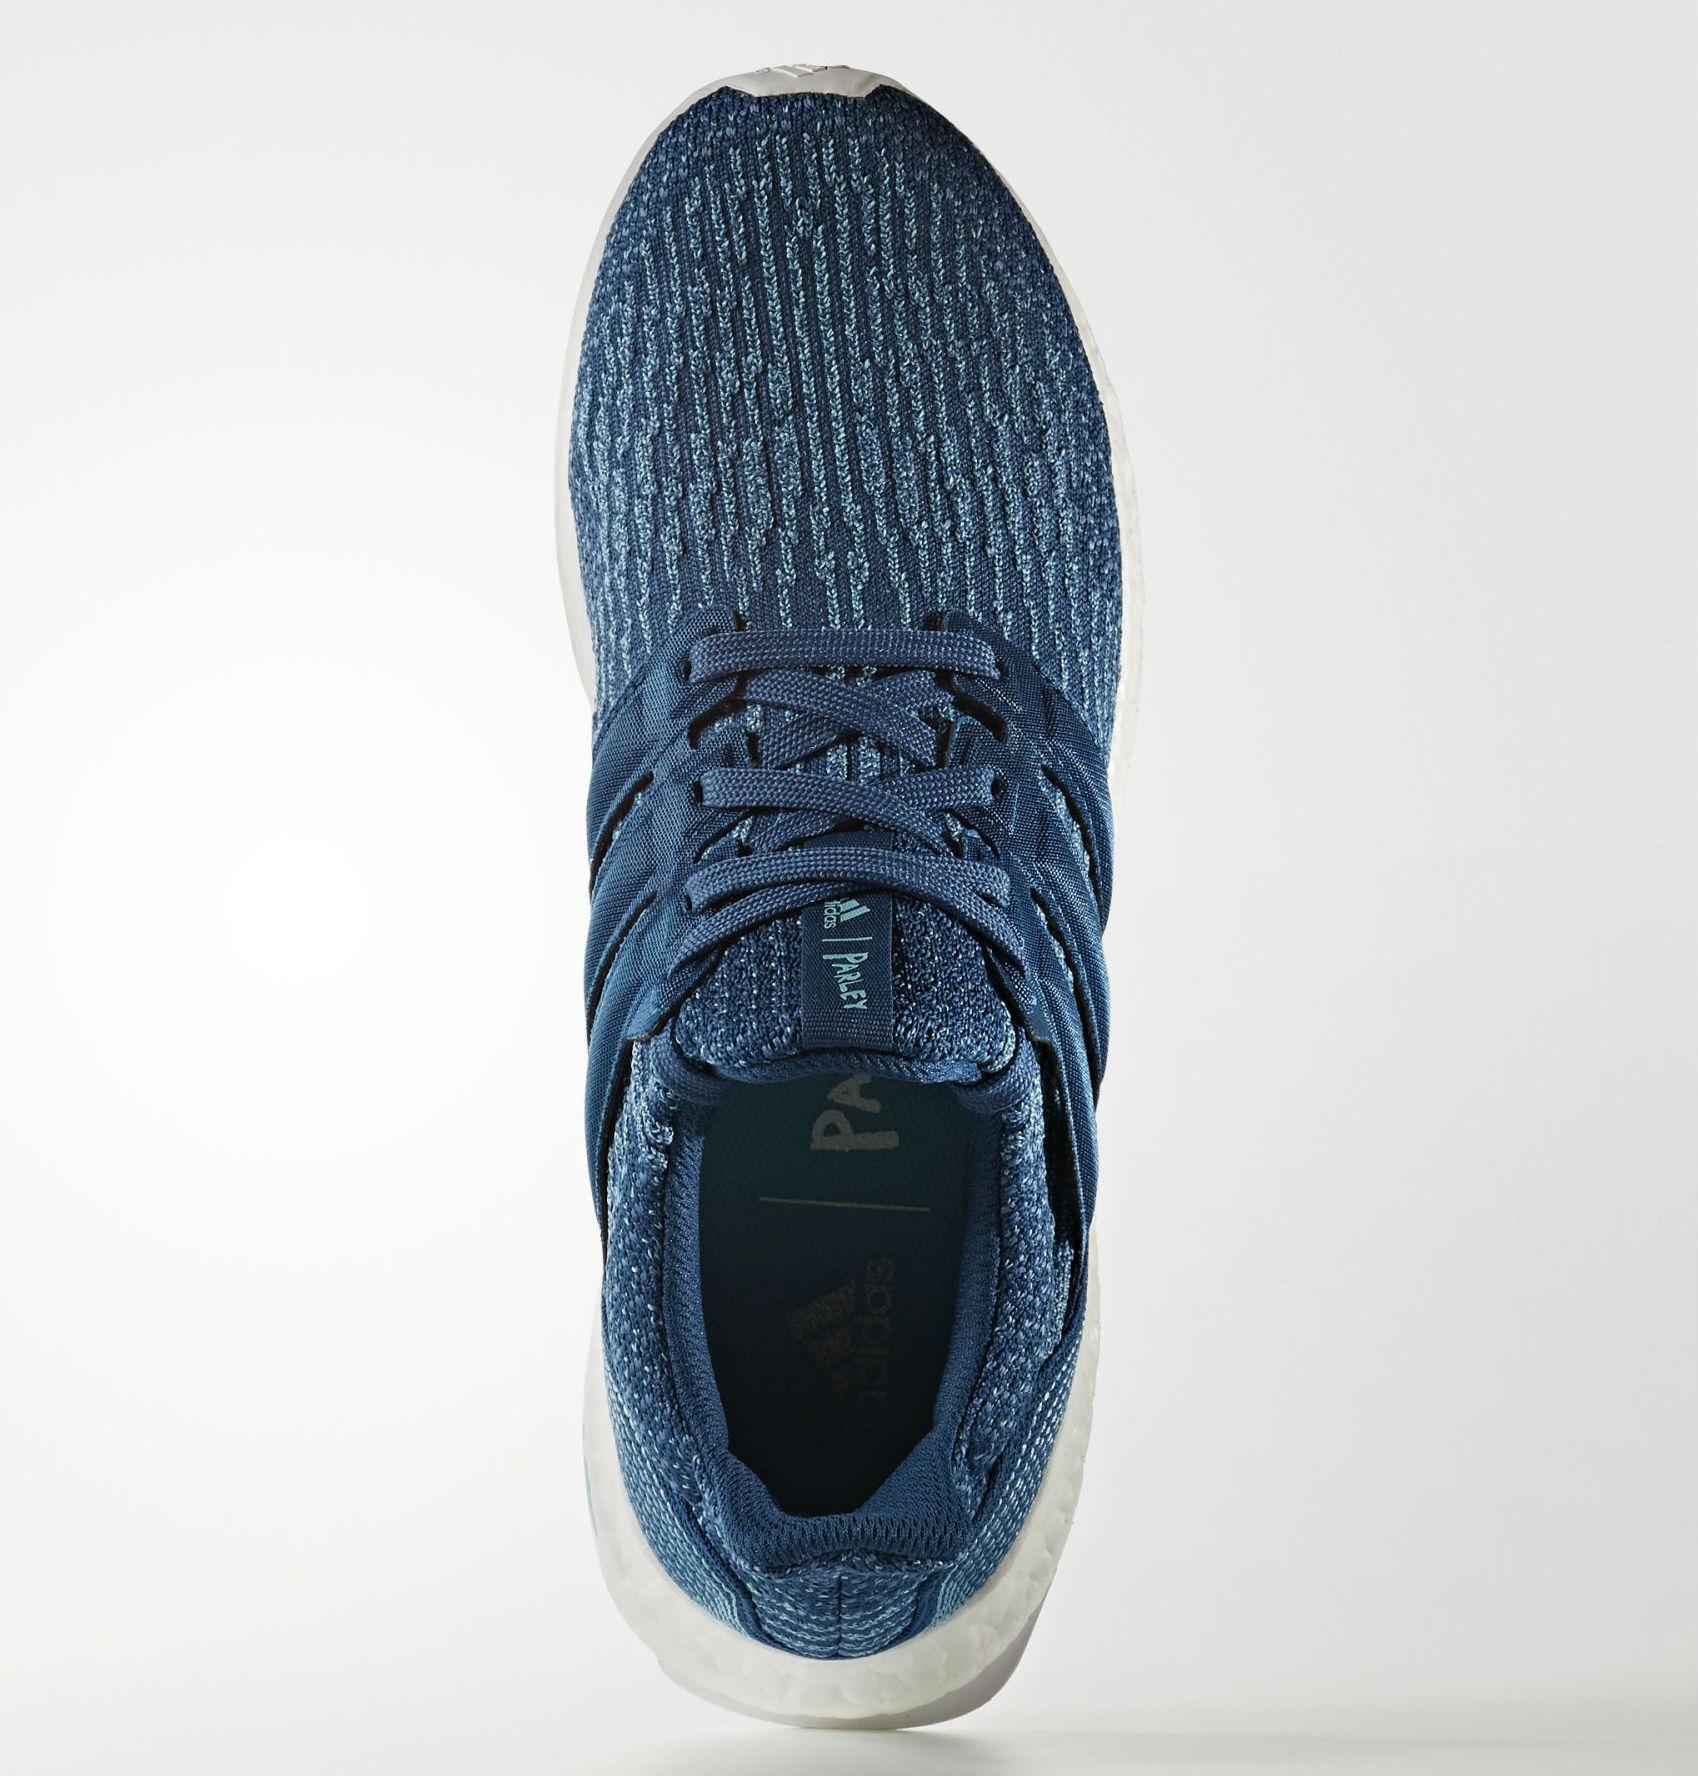 Parley x adidas Ultra Boost Blue Men's Top BB4762